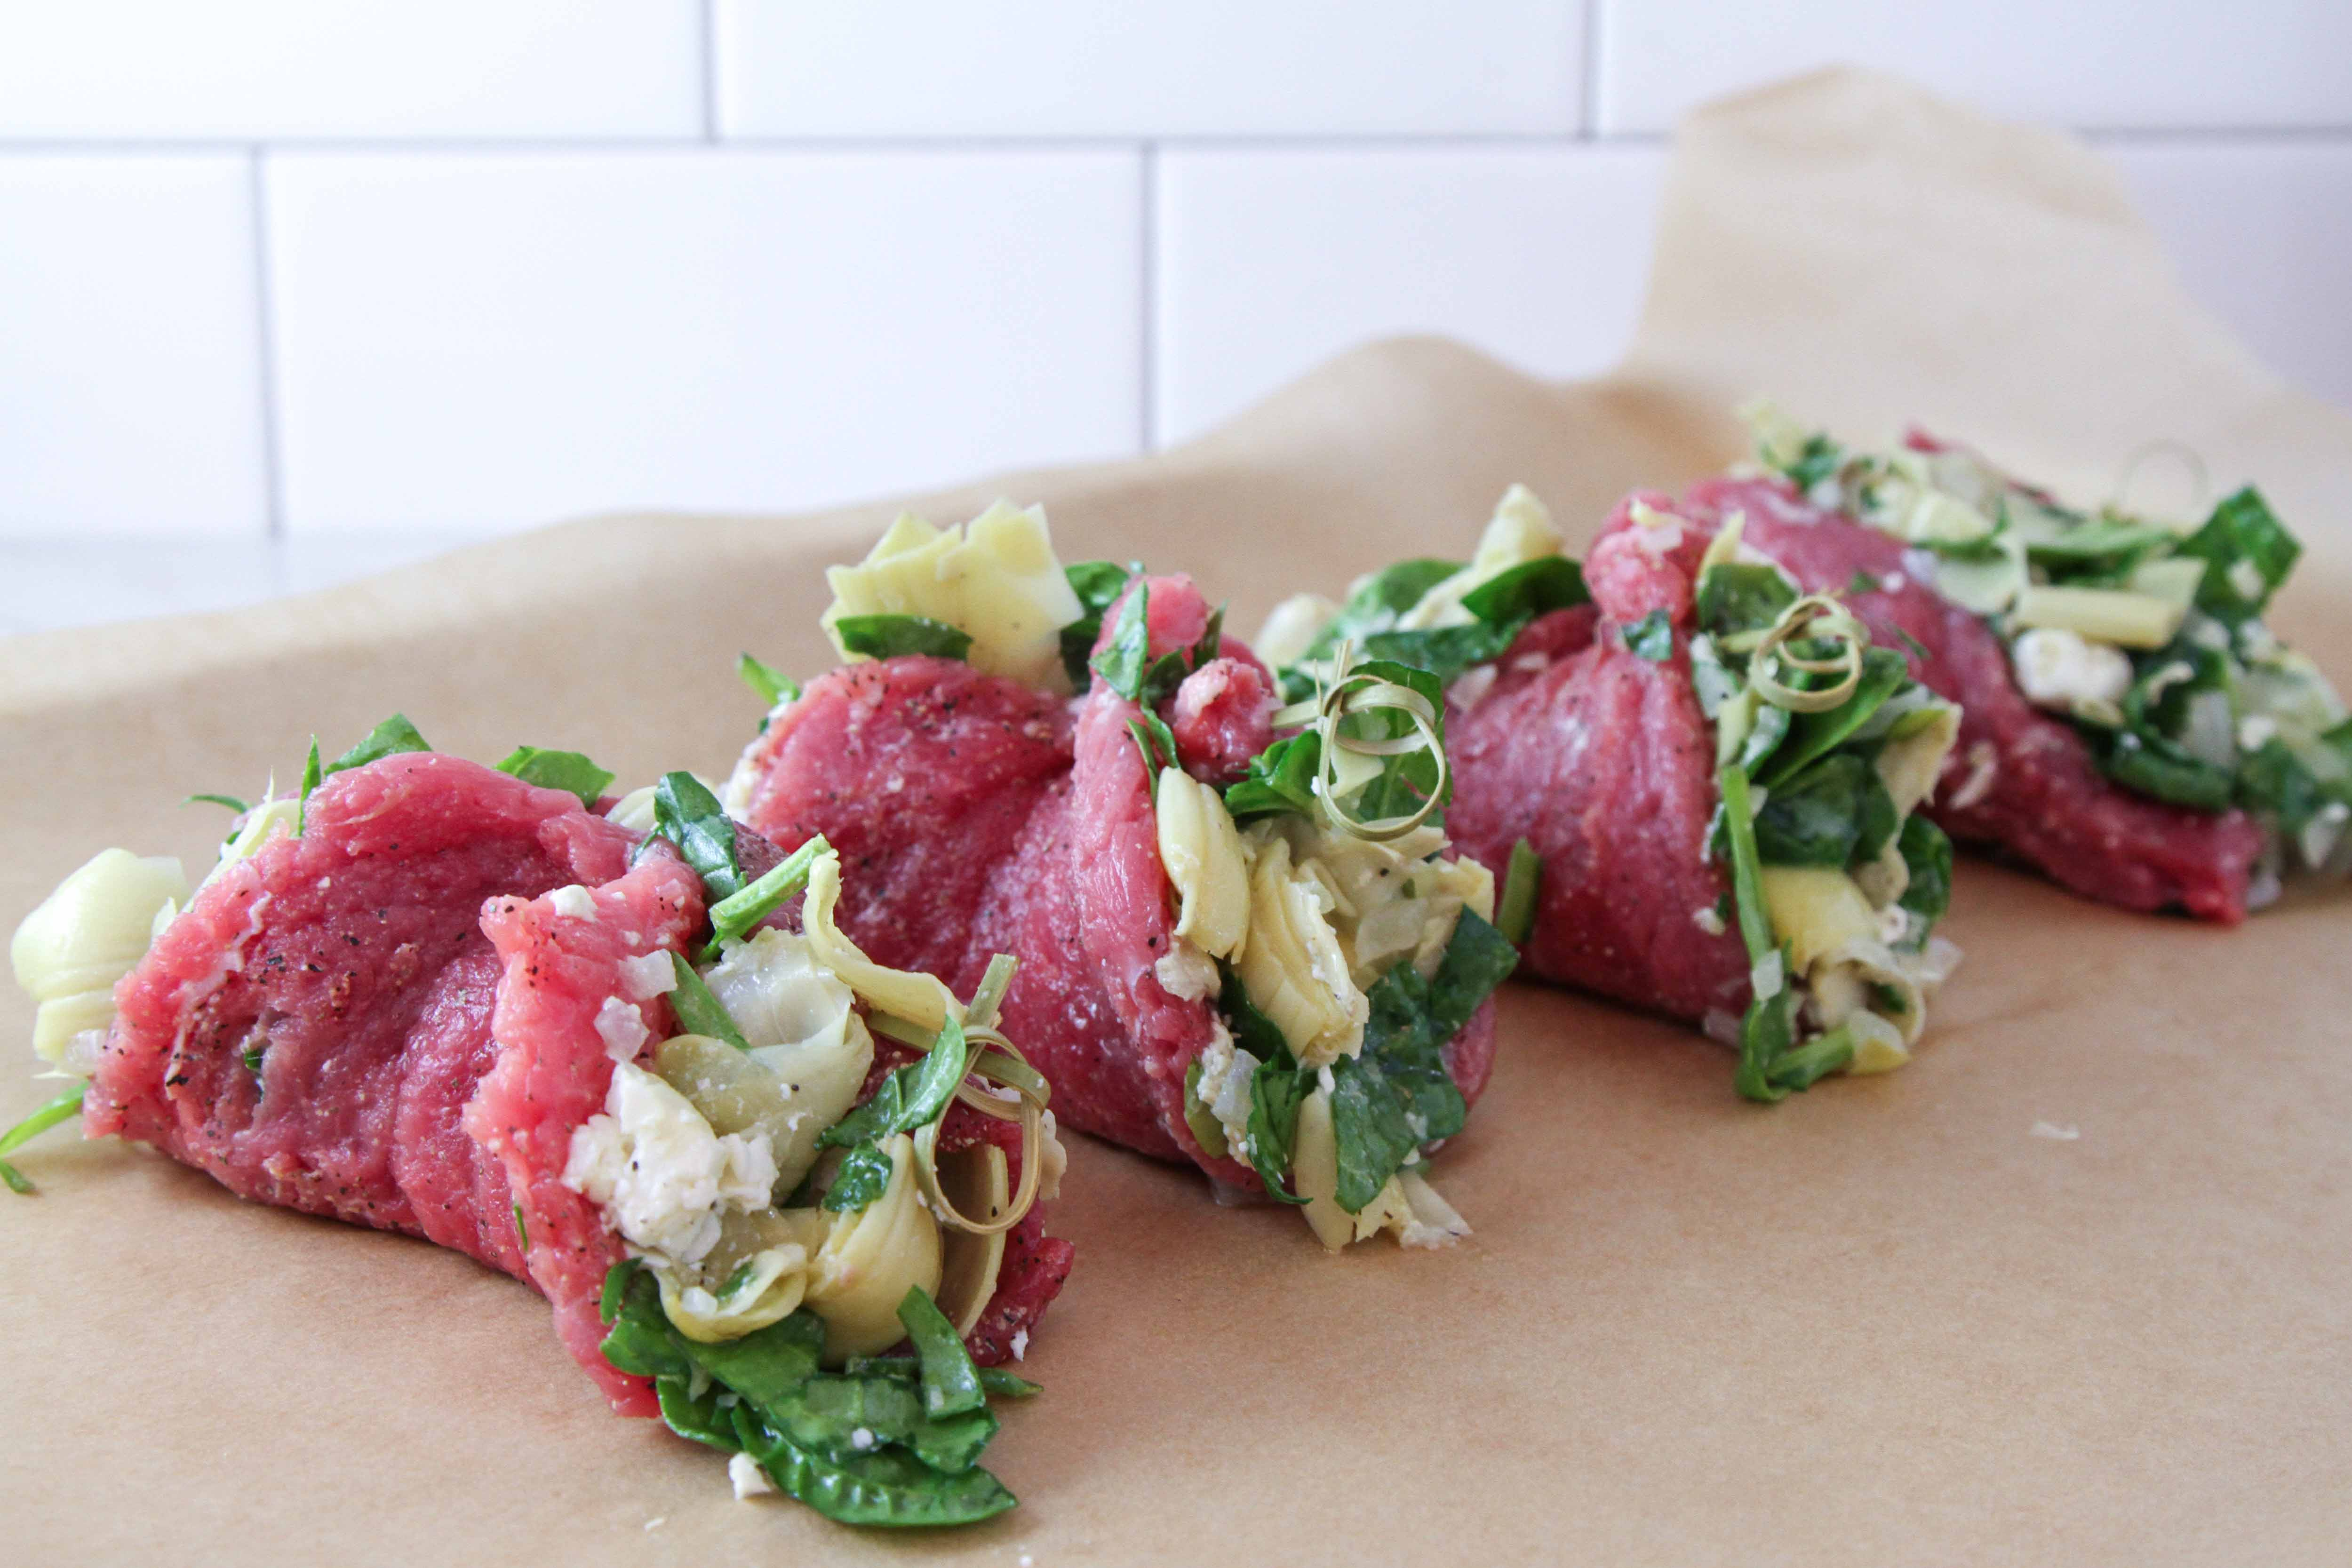 Stuffed Sirloin Steak